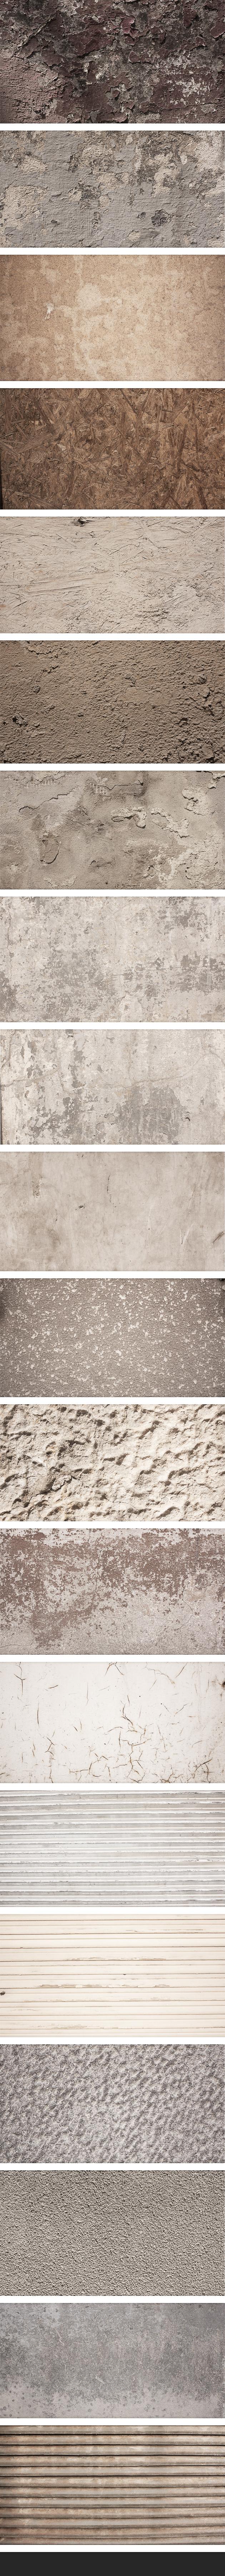 Free Grunge Textures Set designtnt grunge textures large